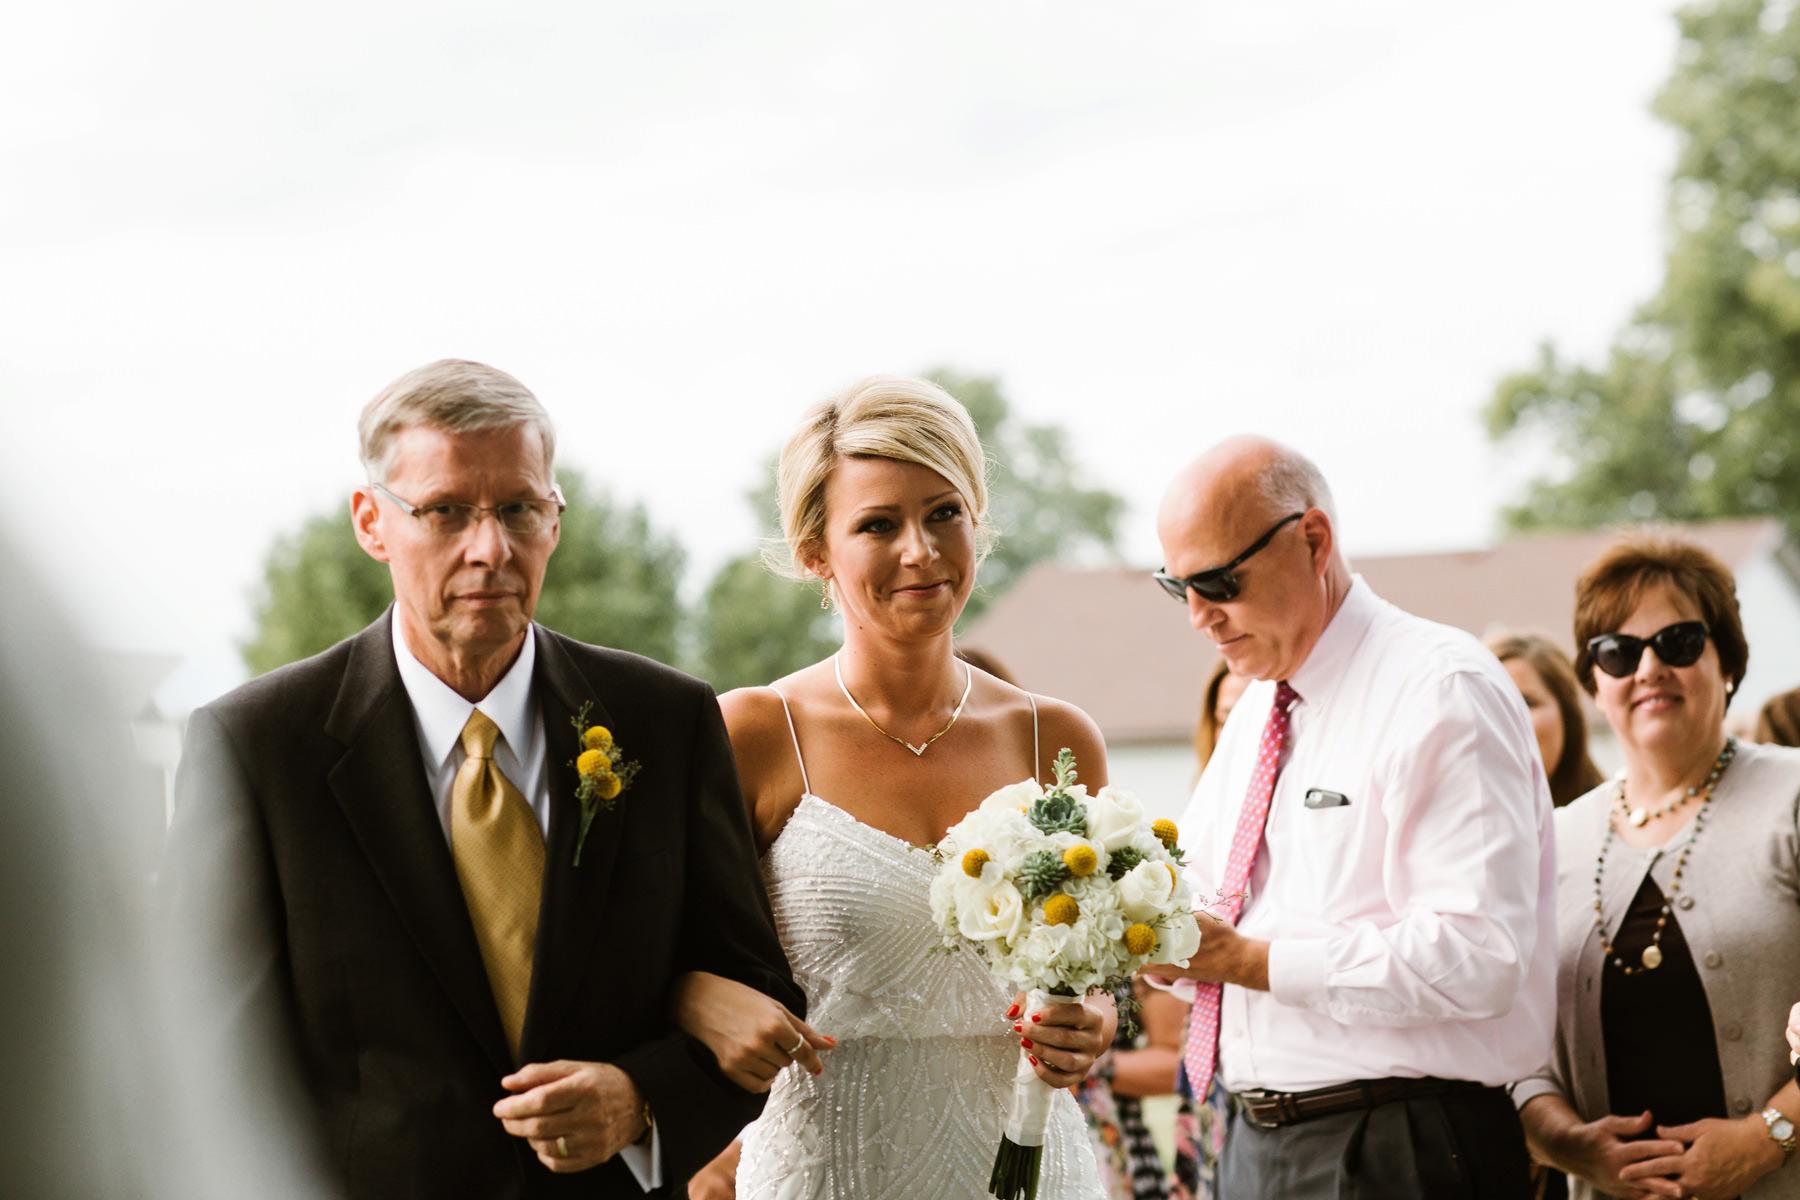 Alldredge Orchard Kansas City_Kindling Wedding Photography BLOG 41.JPG